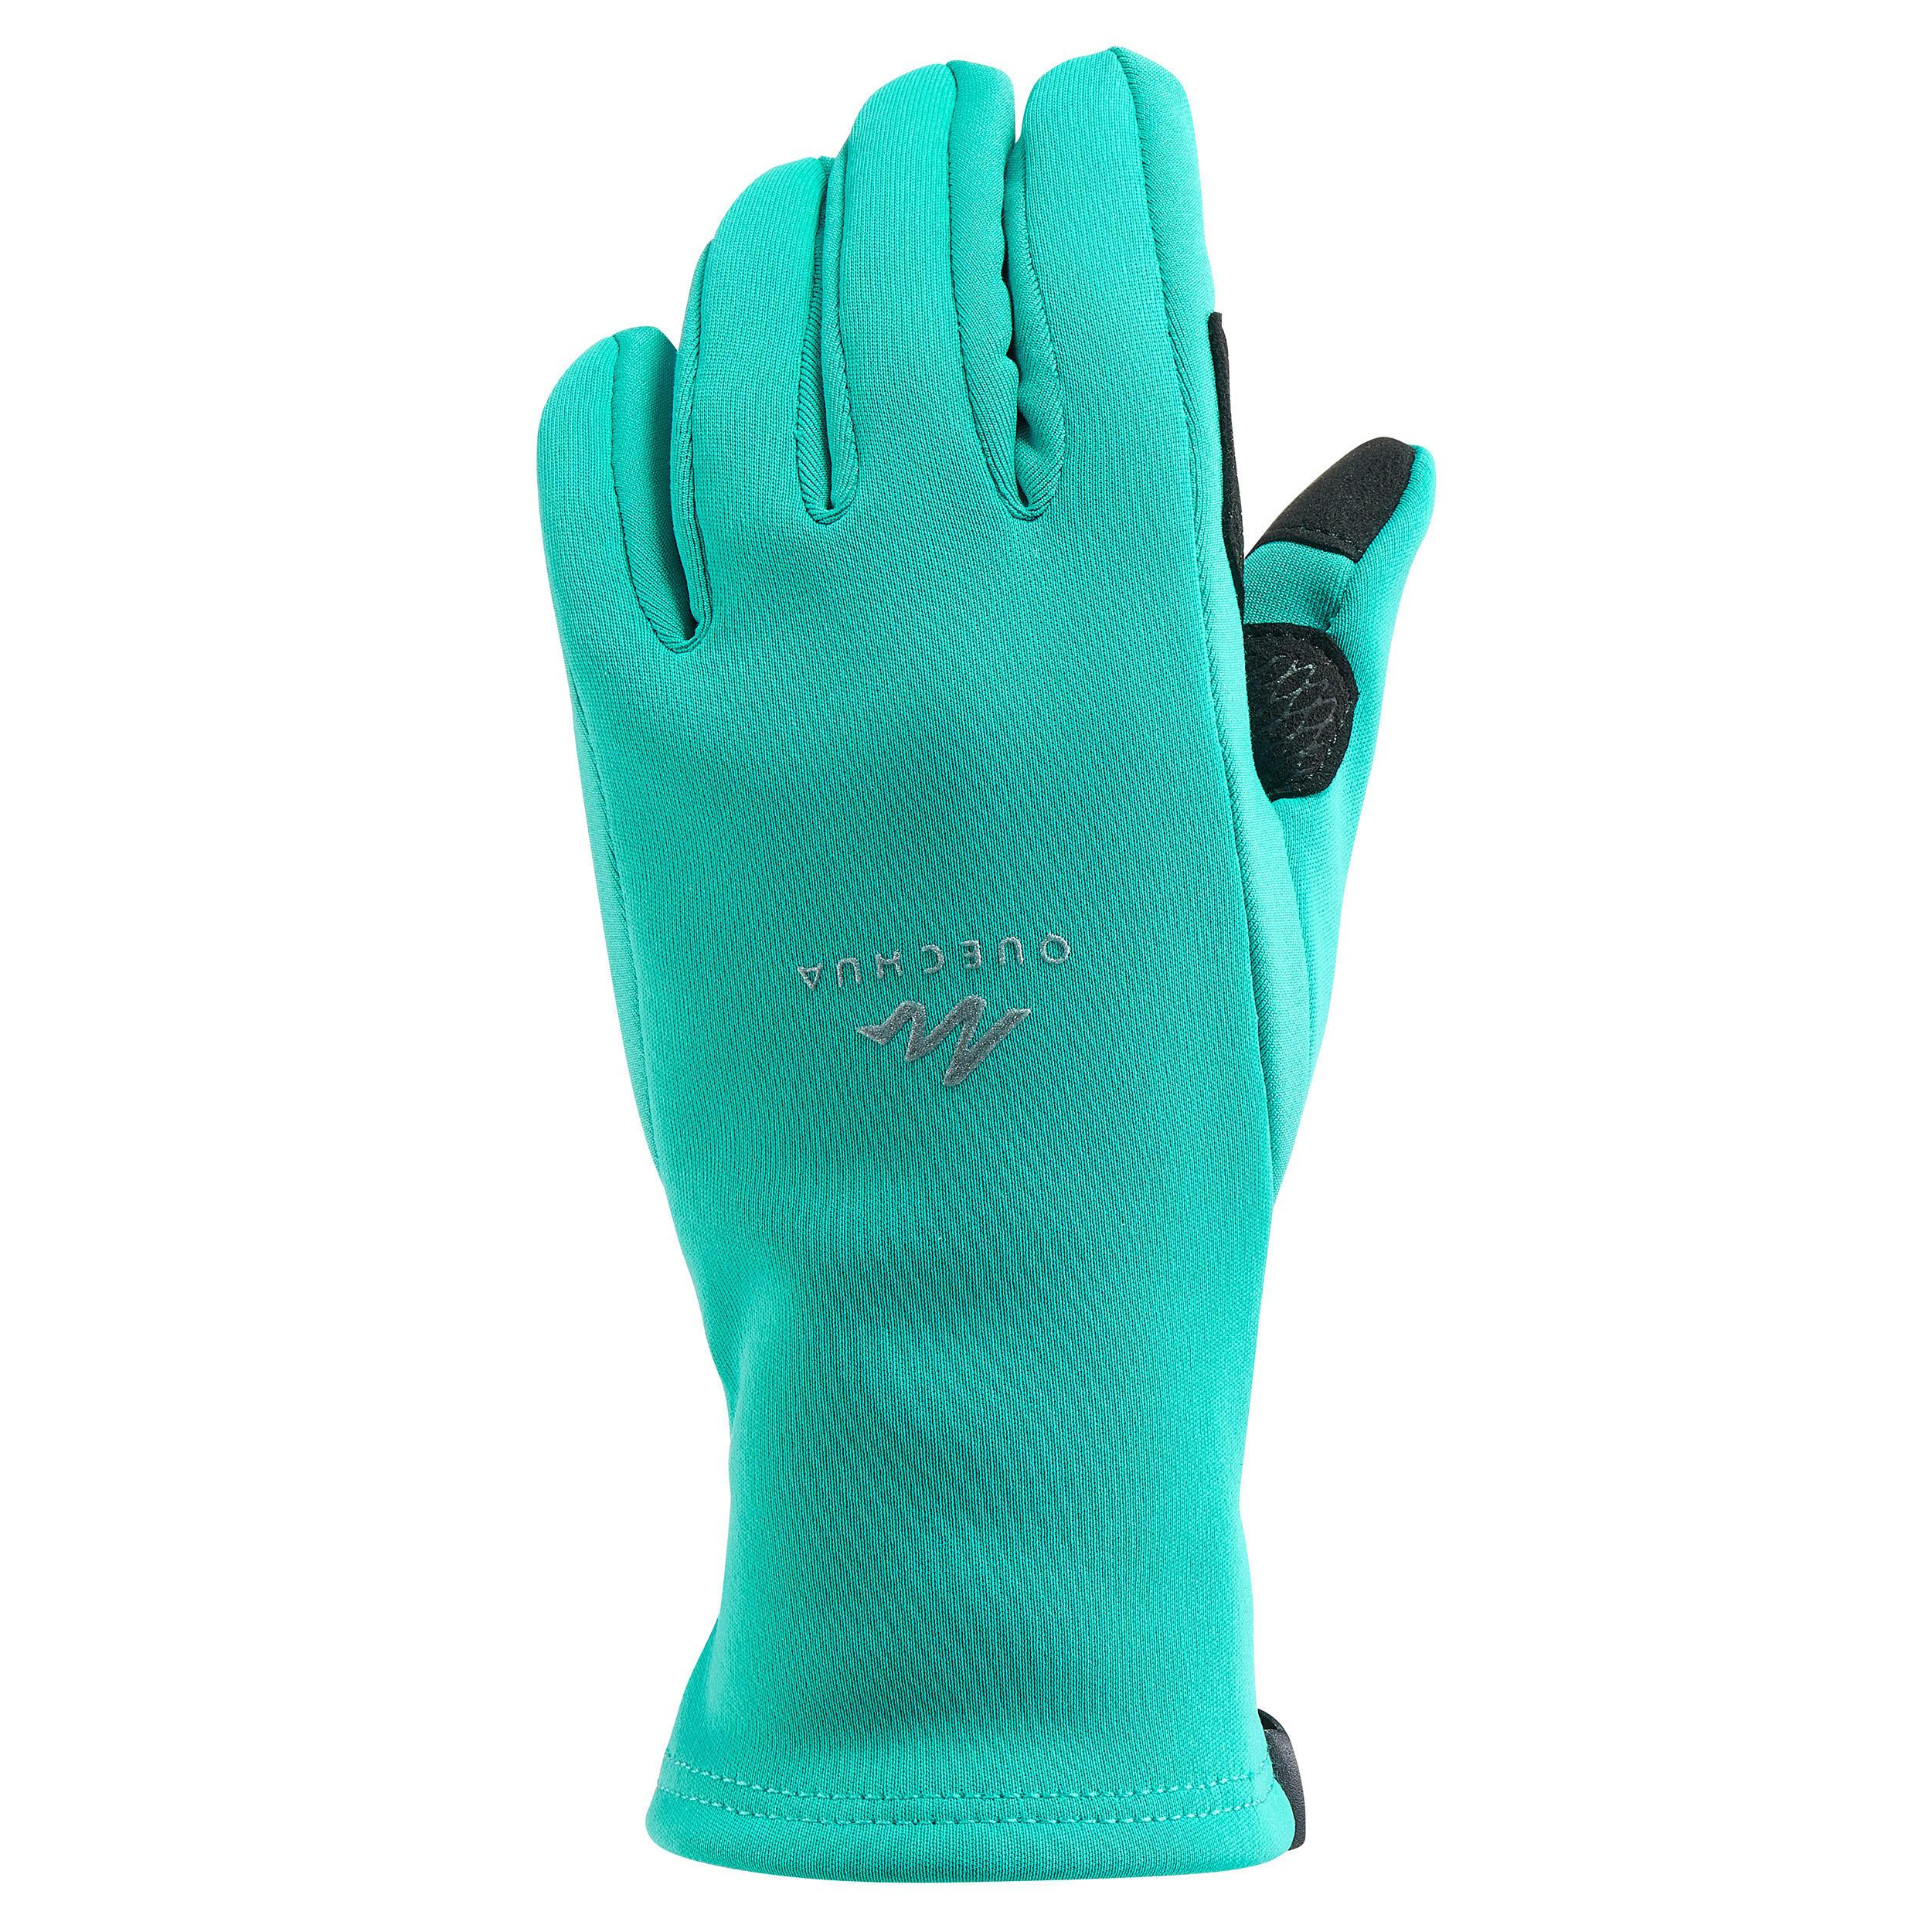 Mănuși SH500 STRETCH Copii imagine produs